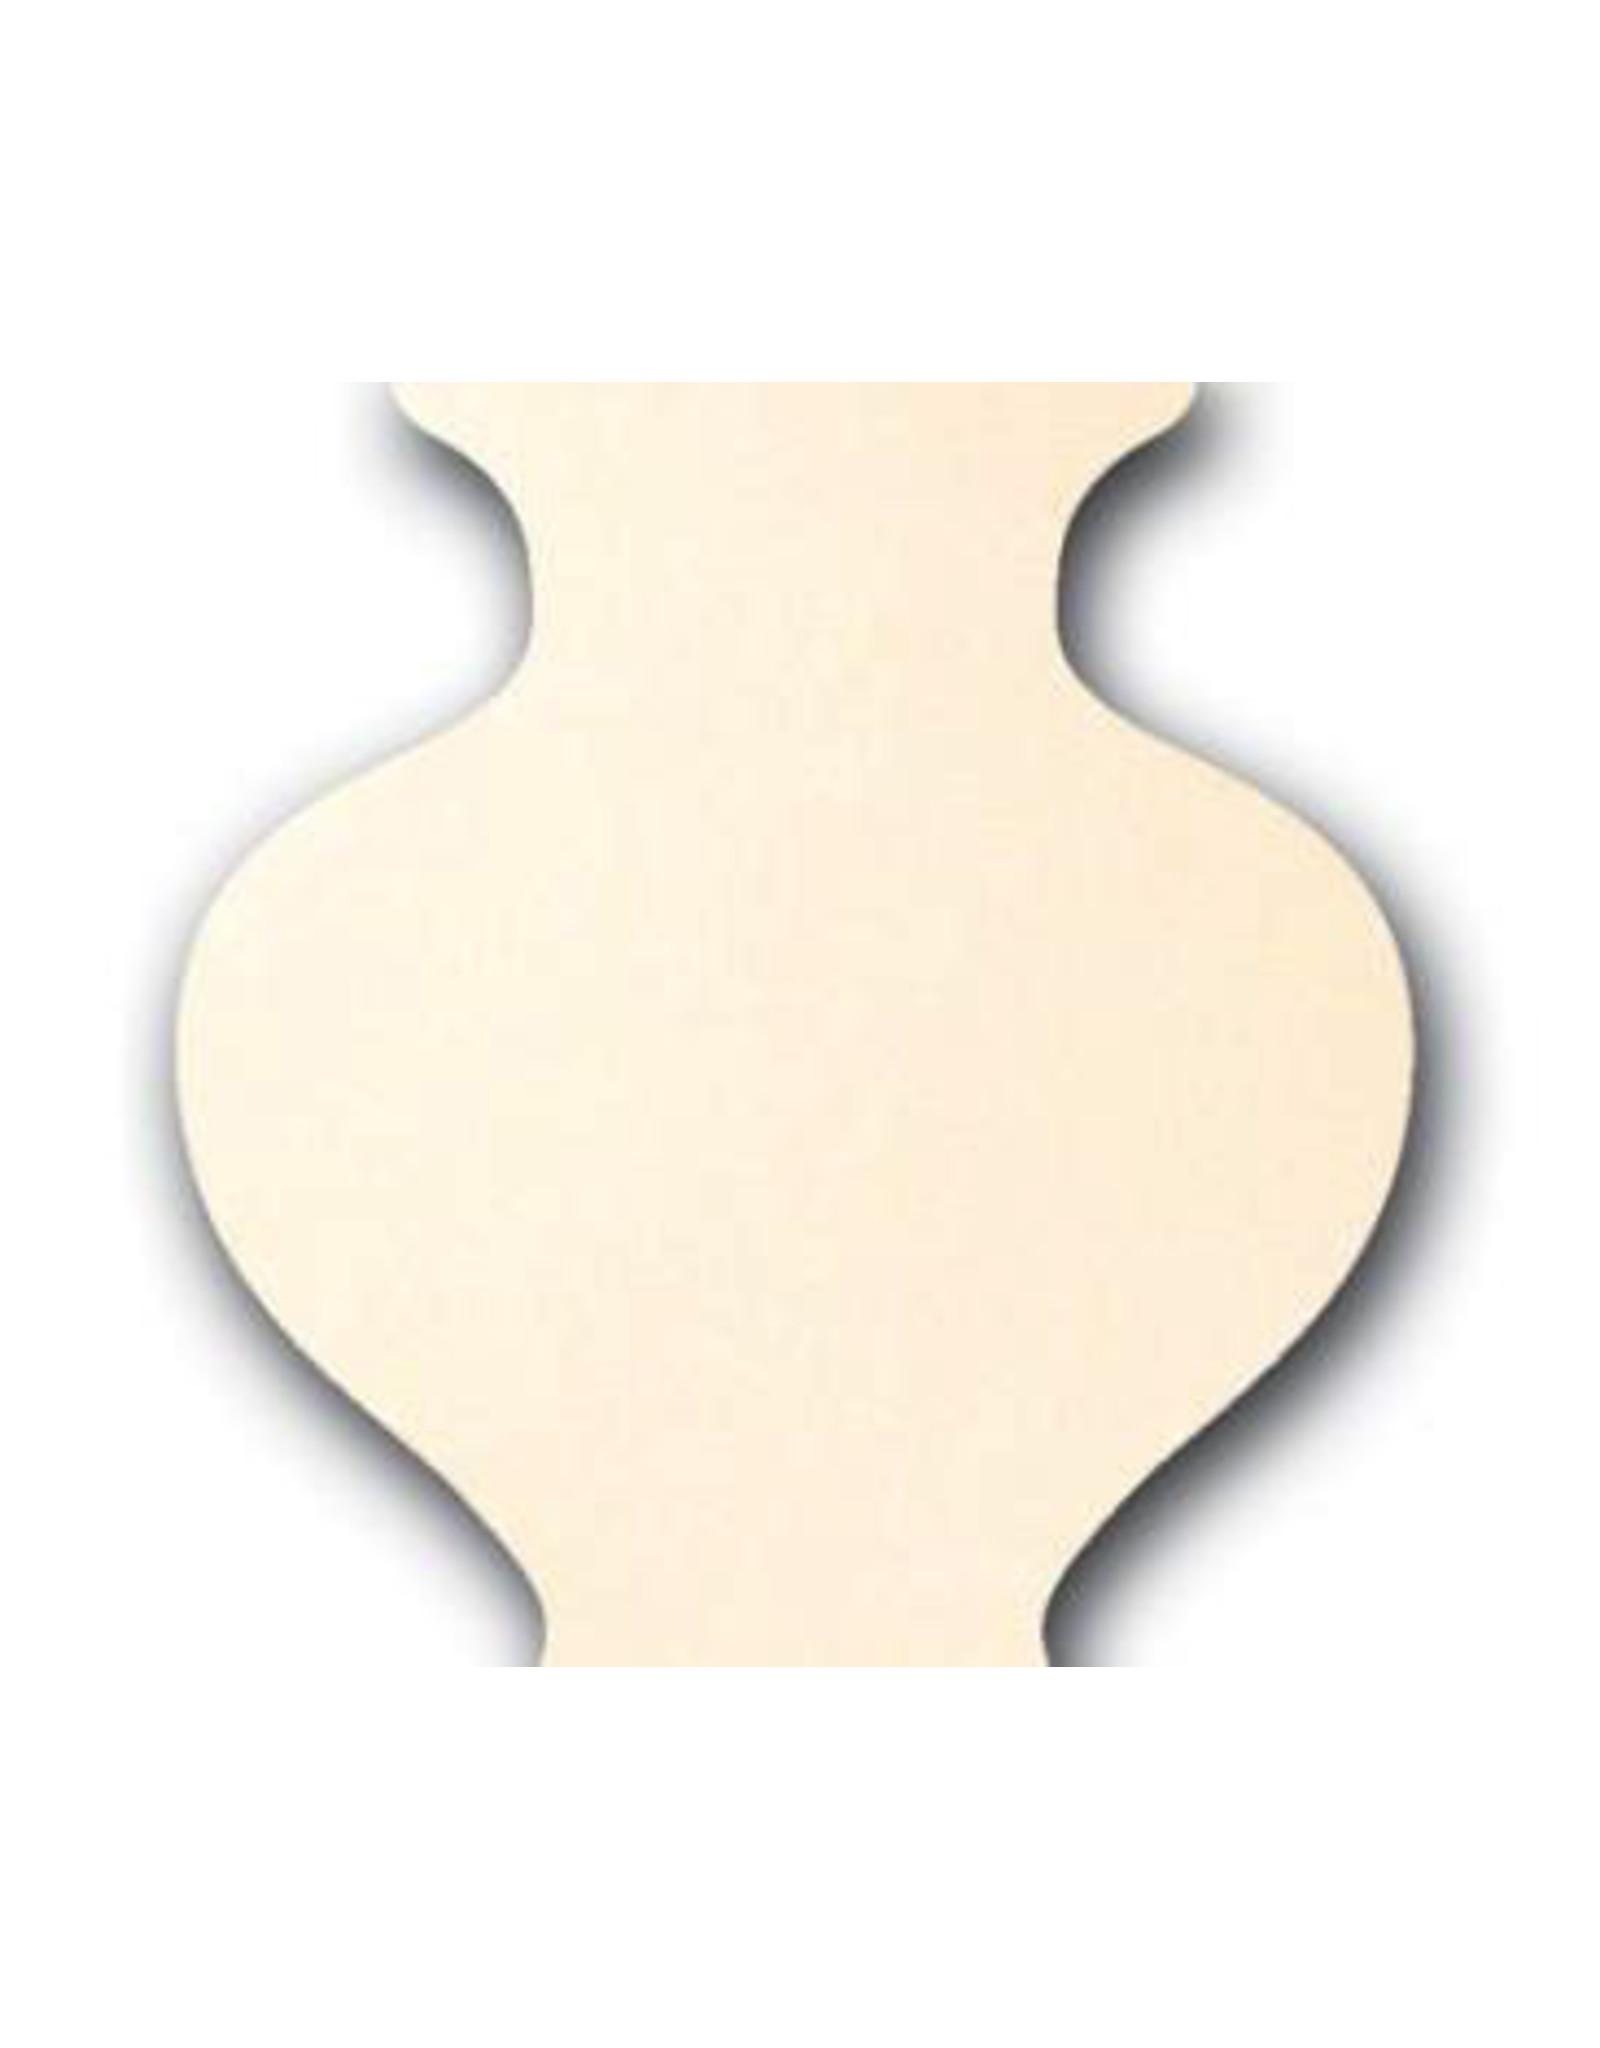 Valentines Royale Porcelain 12.5kg 1220˚C- 1280˚C